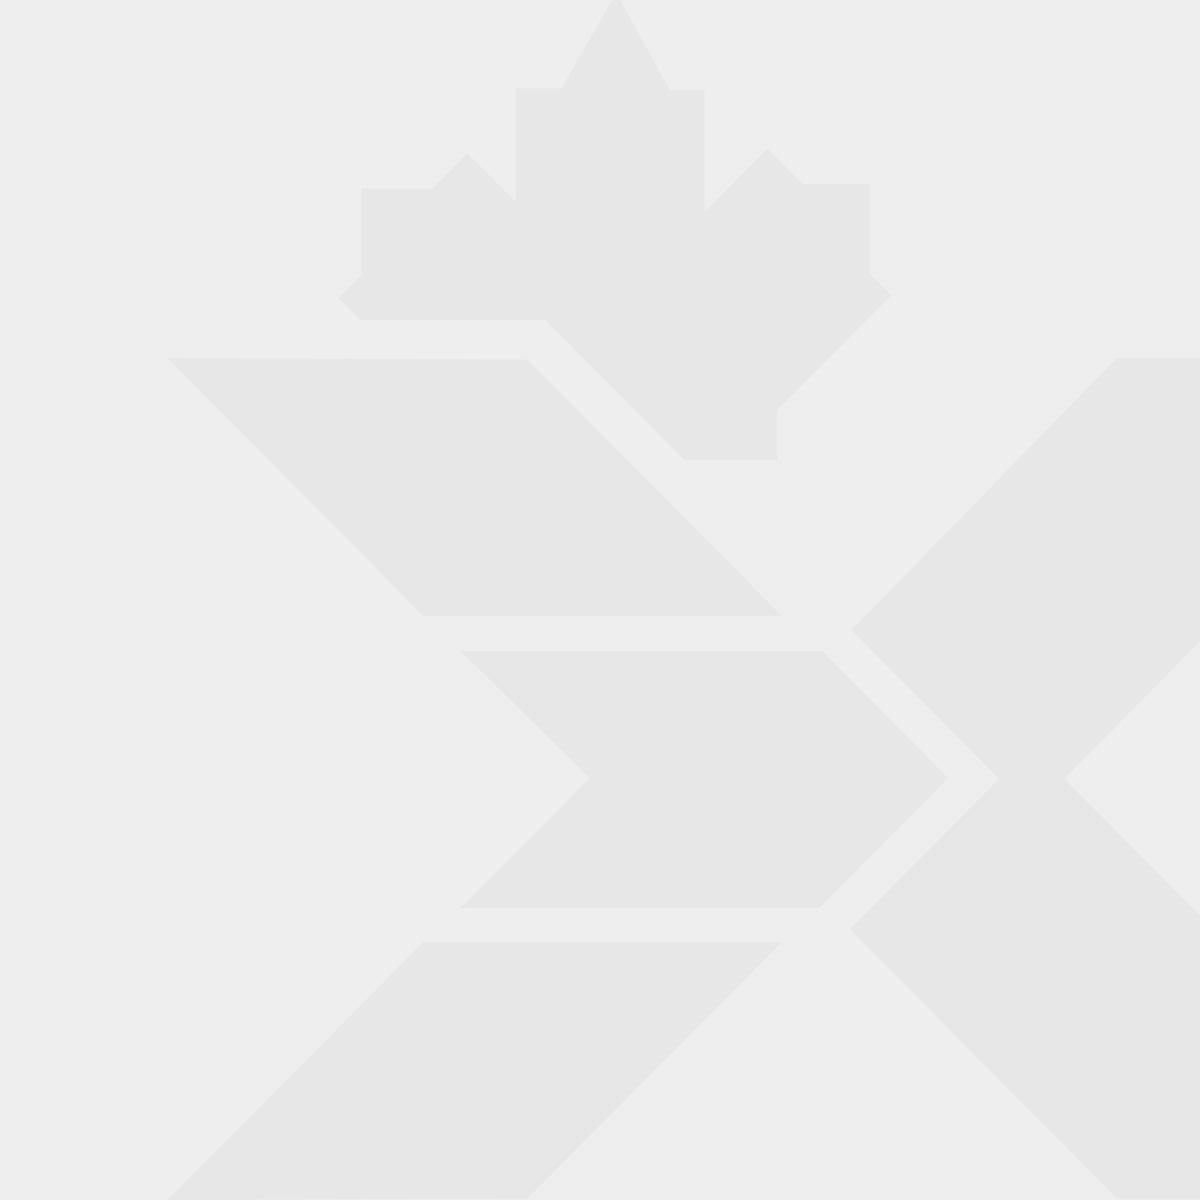 British Columbia Dragoons Cloth Cap Badge